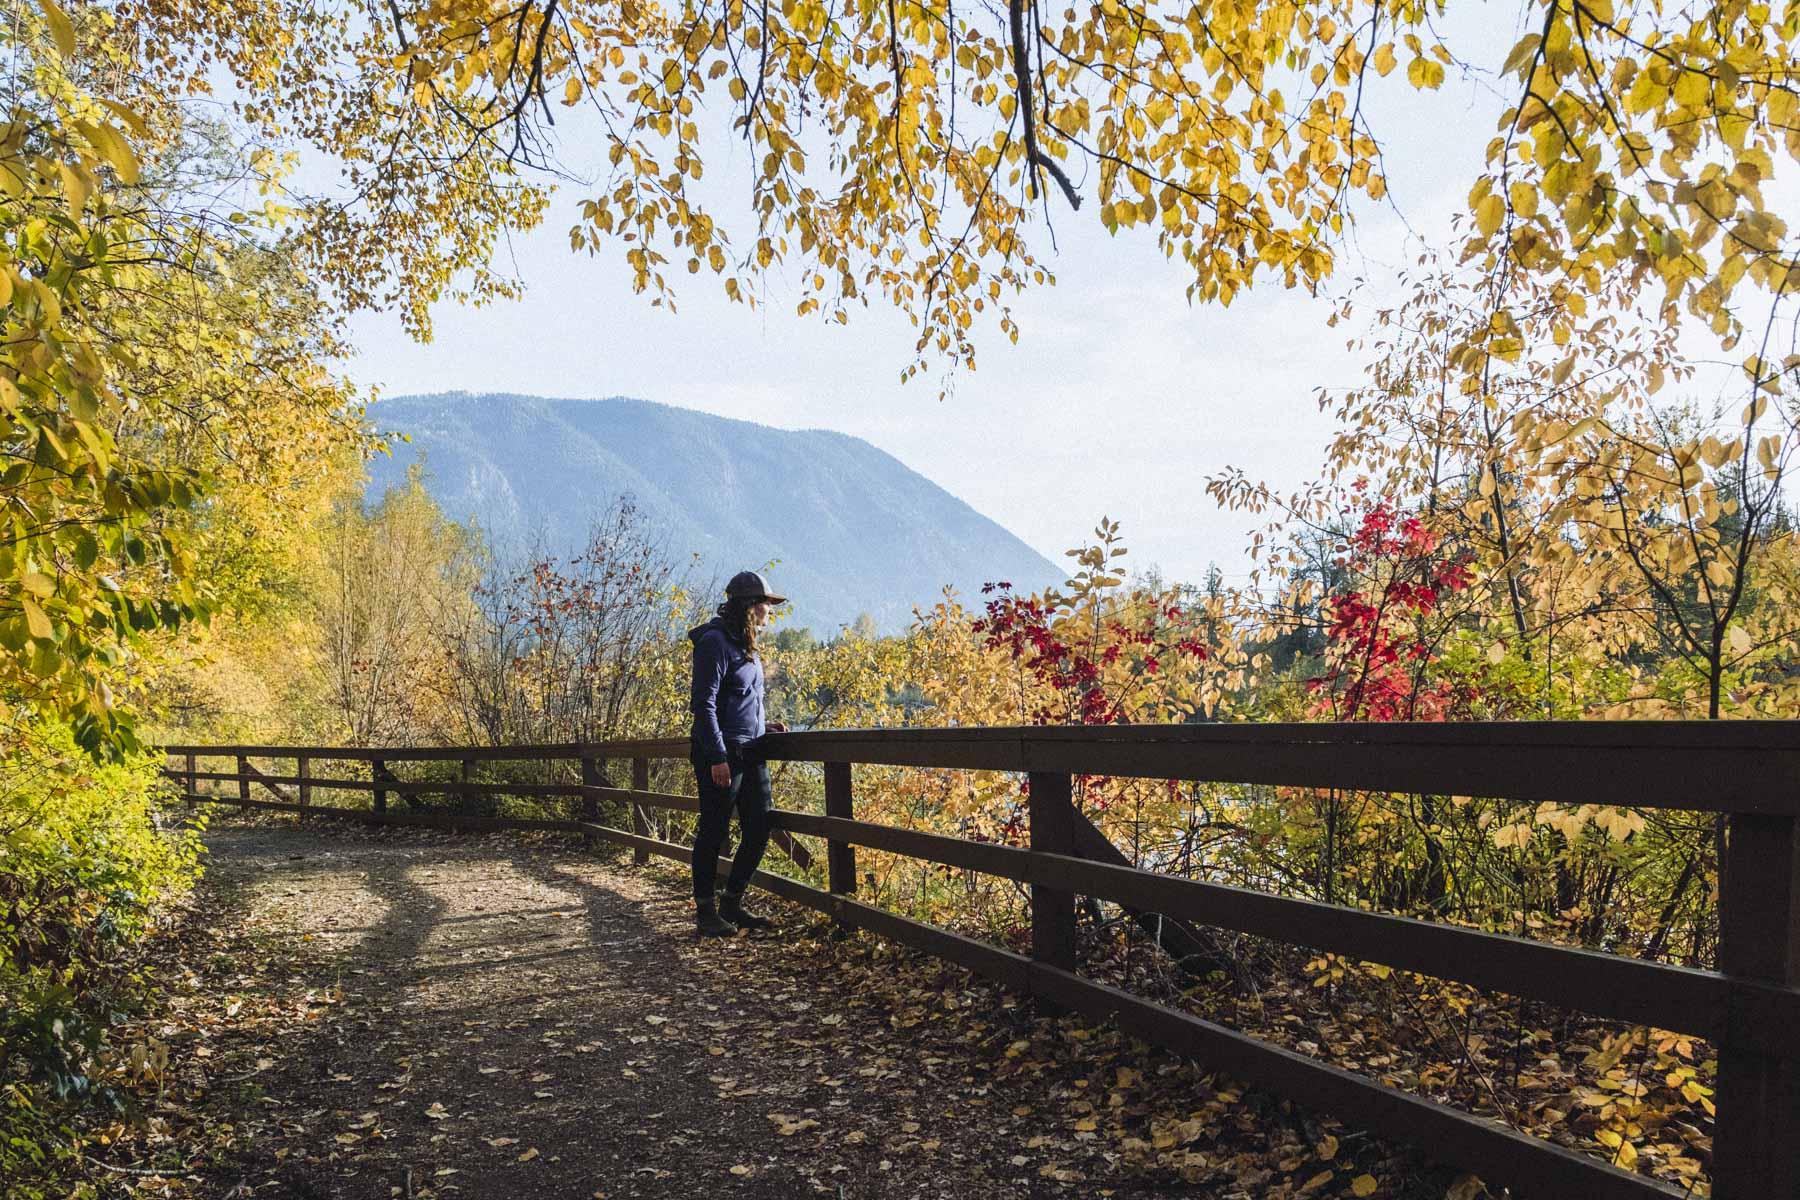 Adams River Salmon Run, Tsútswecw Provincial Park, Shuswap Photo credit: Megan McLellan & Emanuel Smedbol